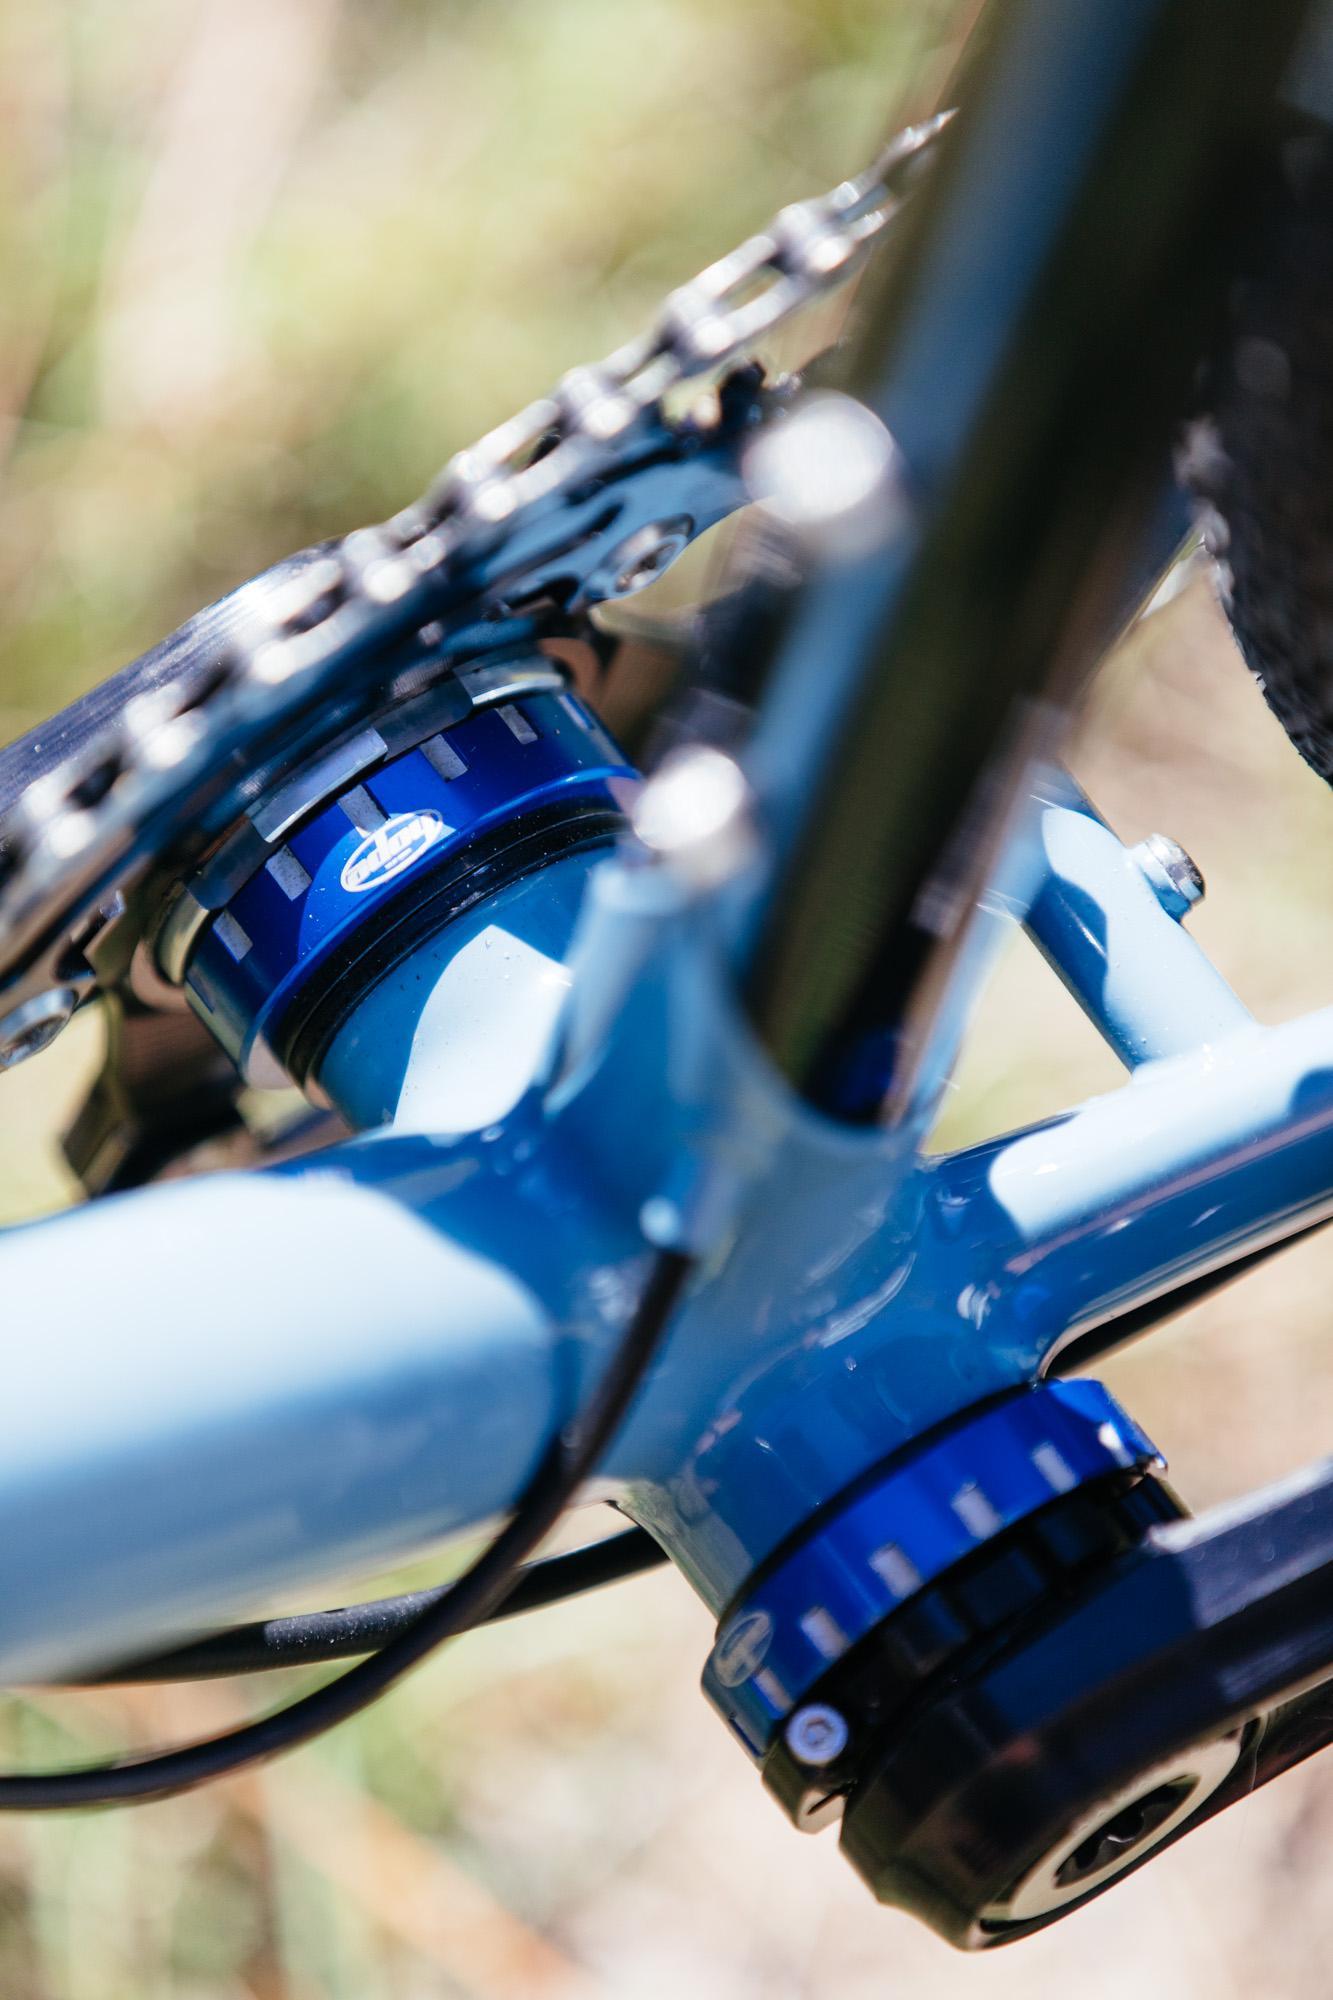 2019 Grinduro Steve Rex Gravel Bike